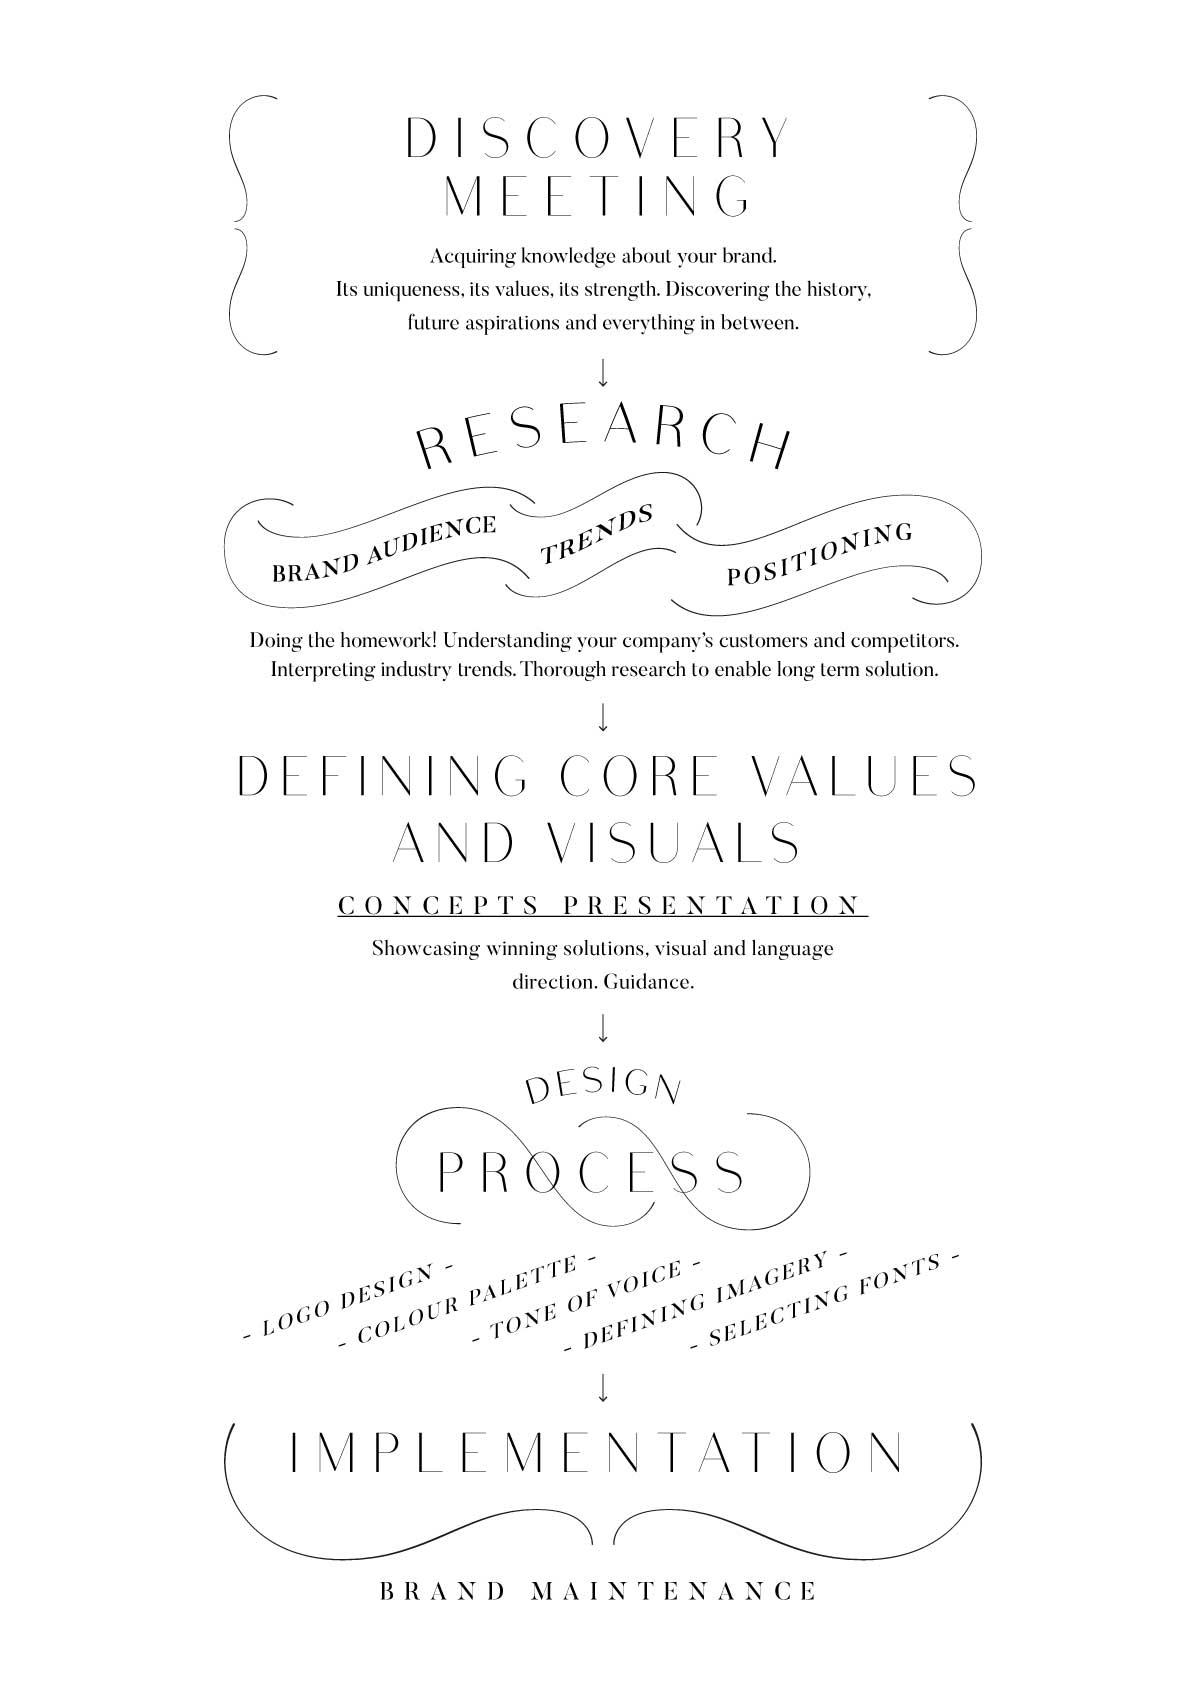 Brand-Identity-Design-Process.jpg